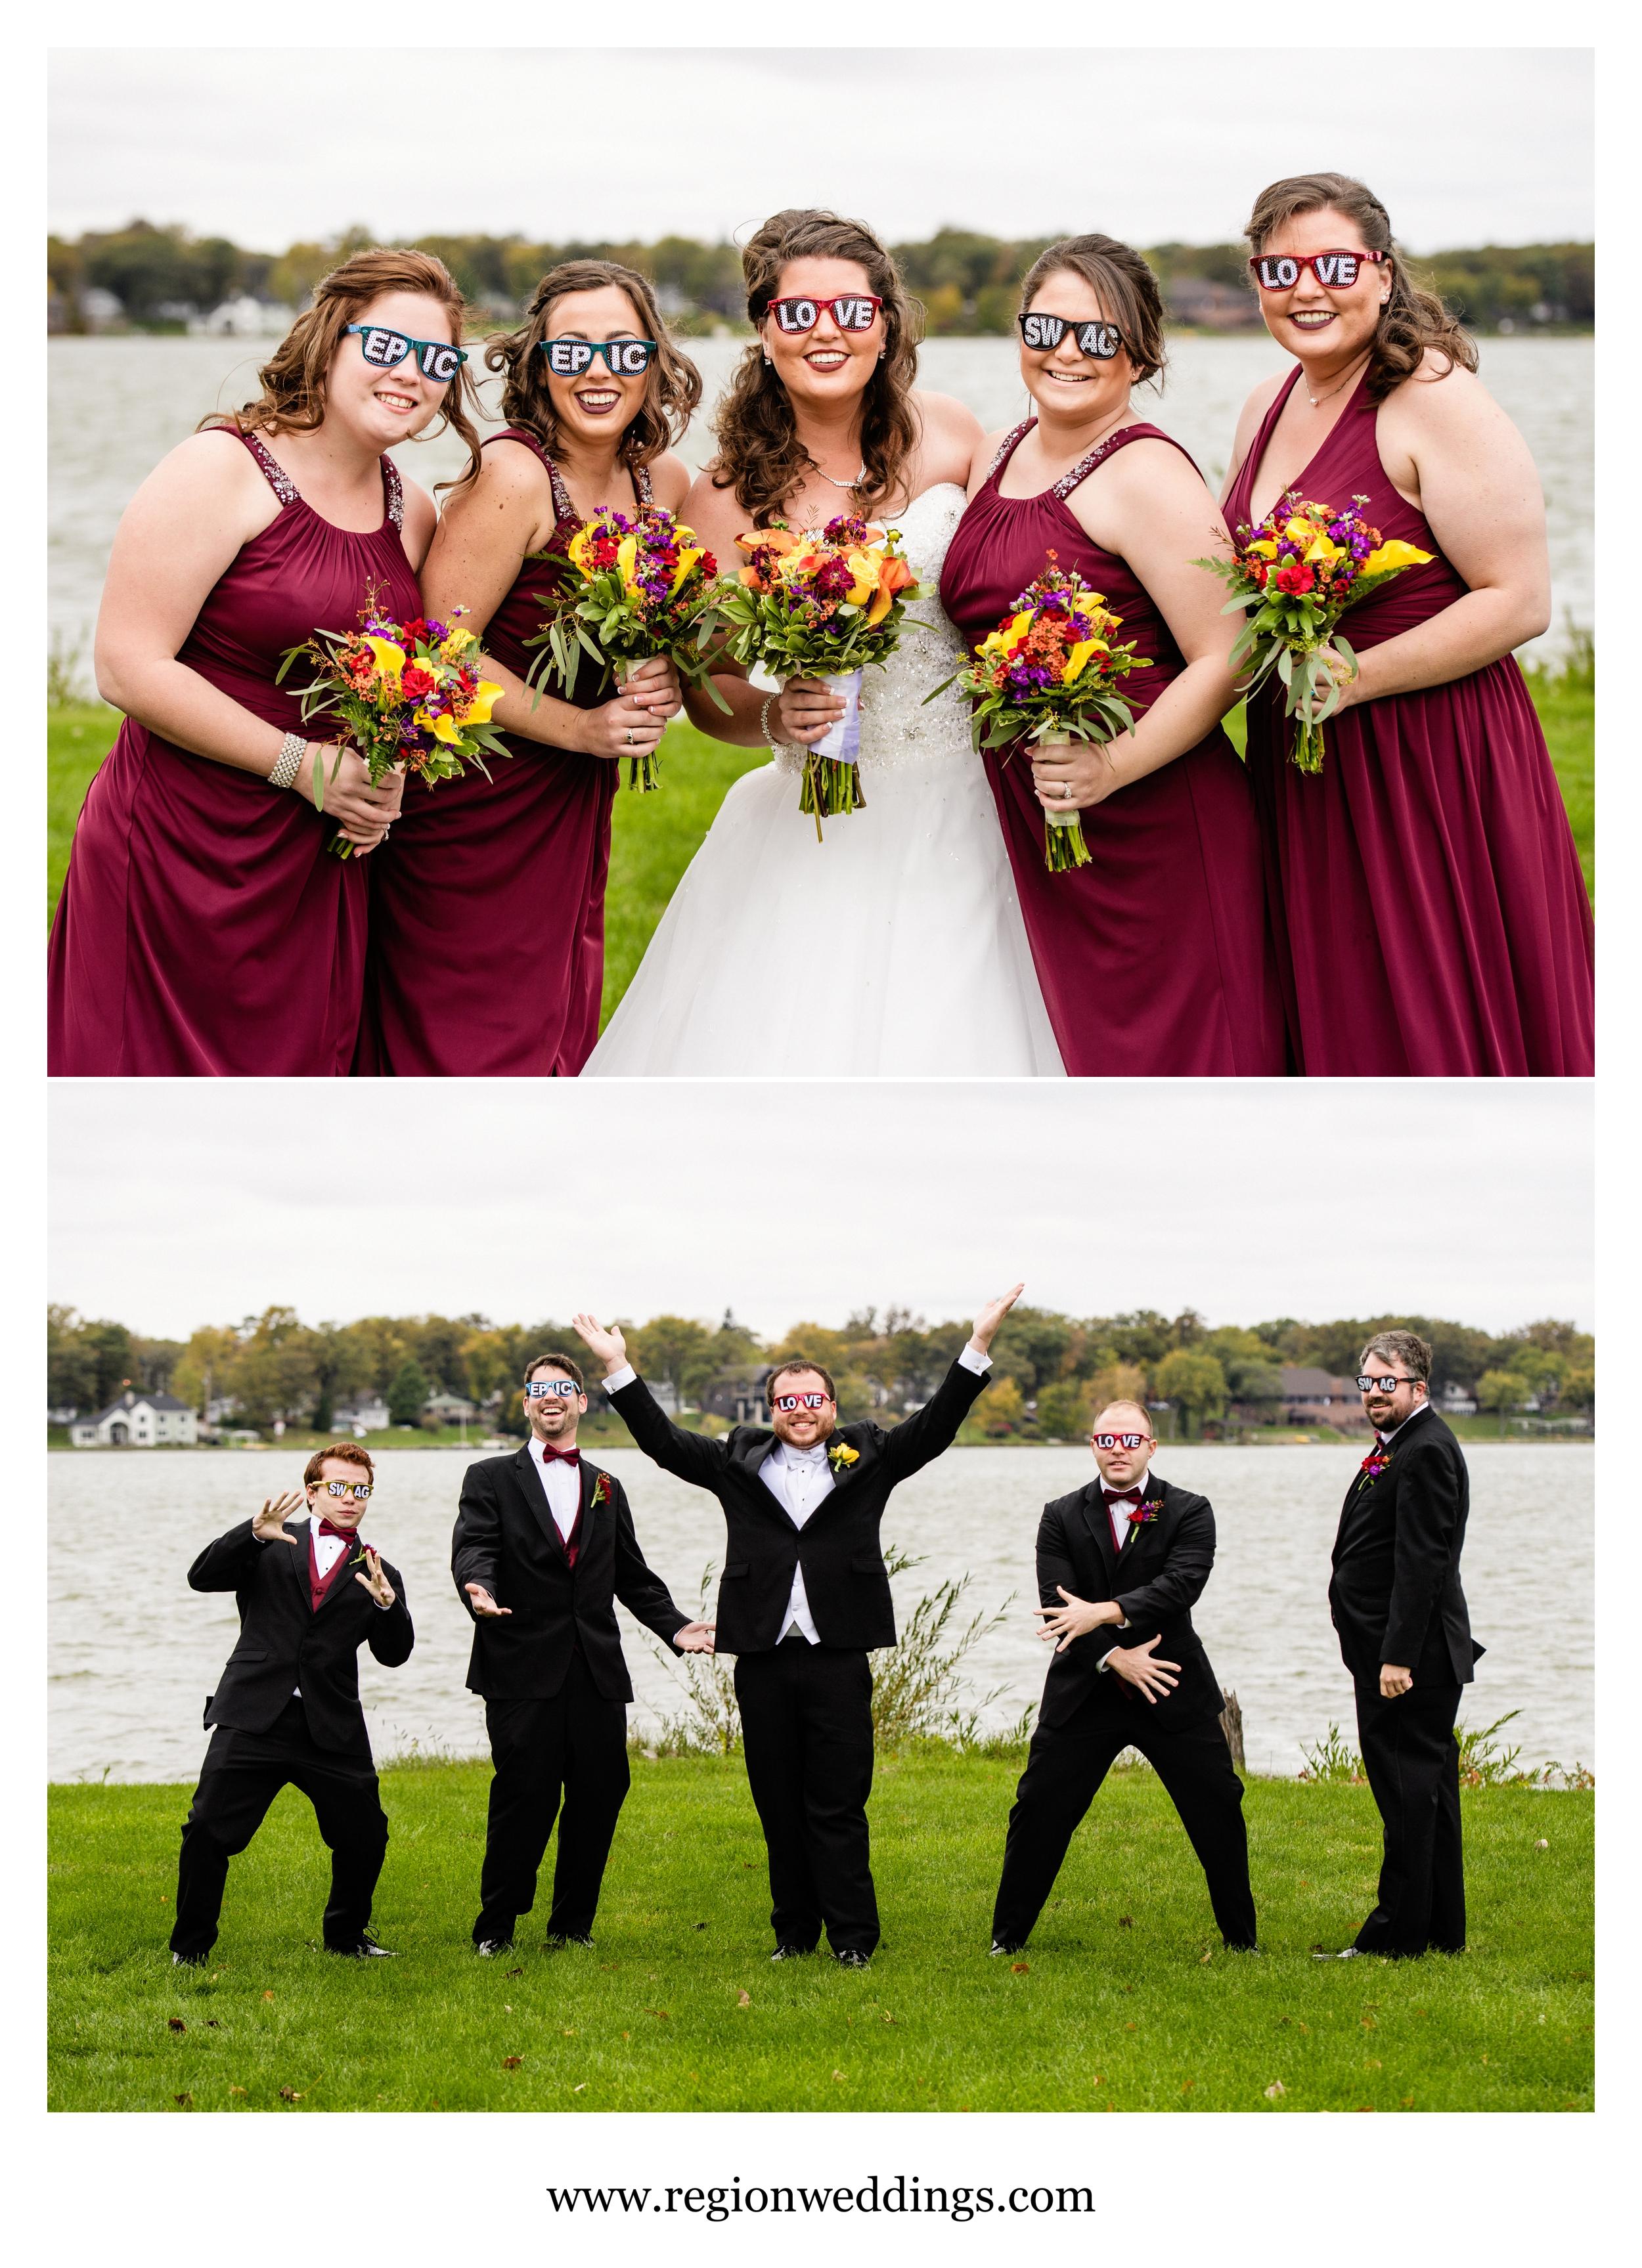 Fun wedding party photos with sunglasses.